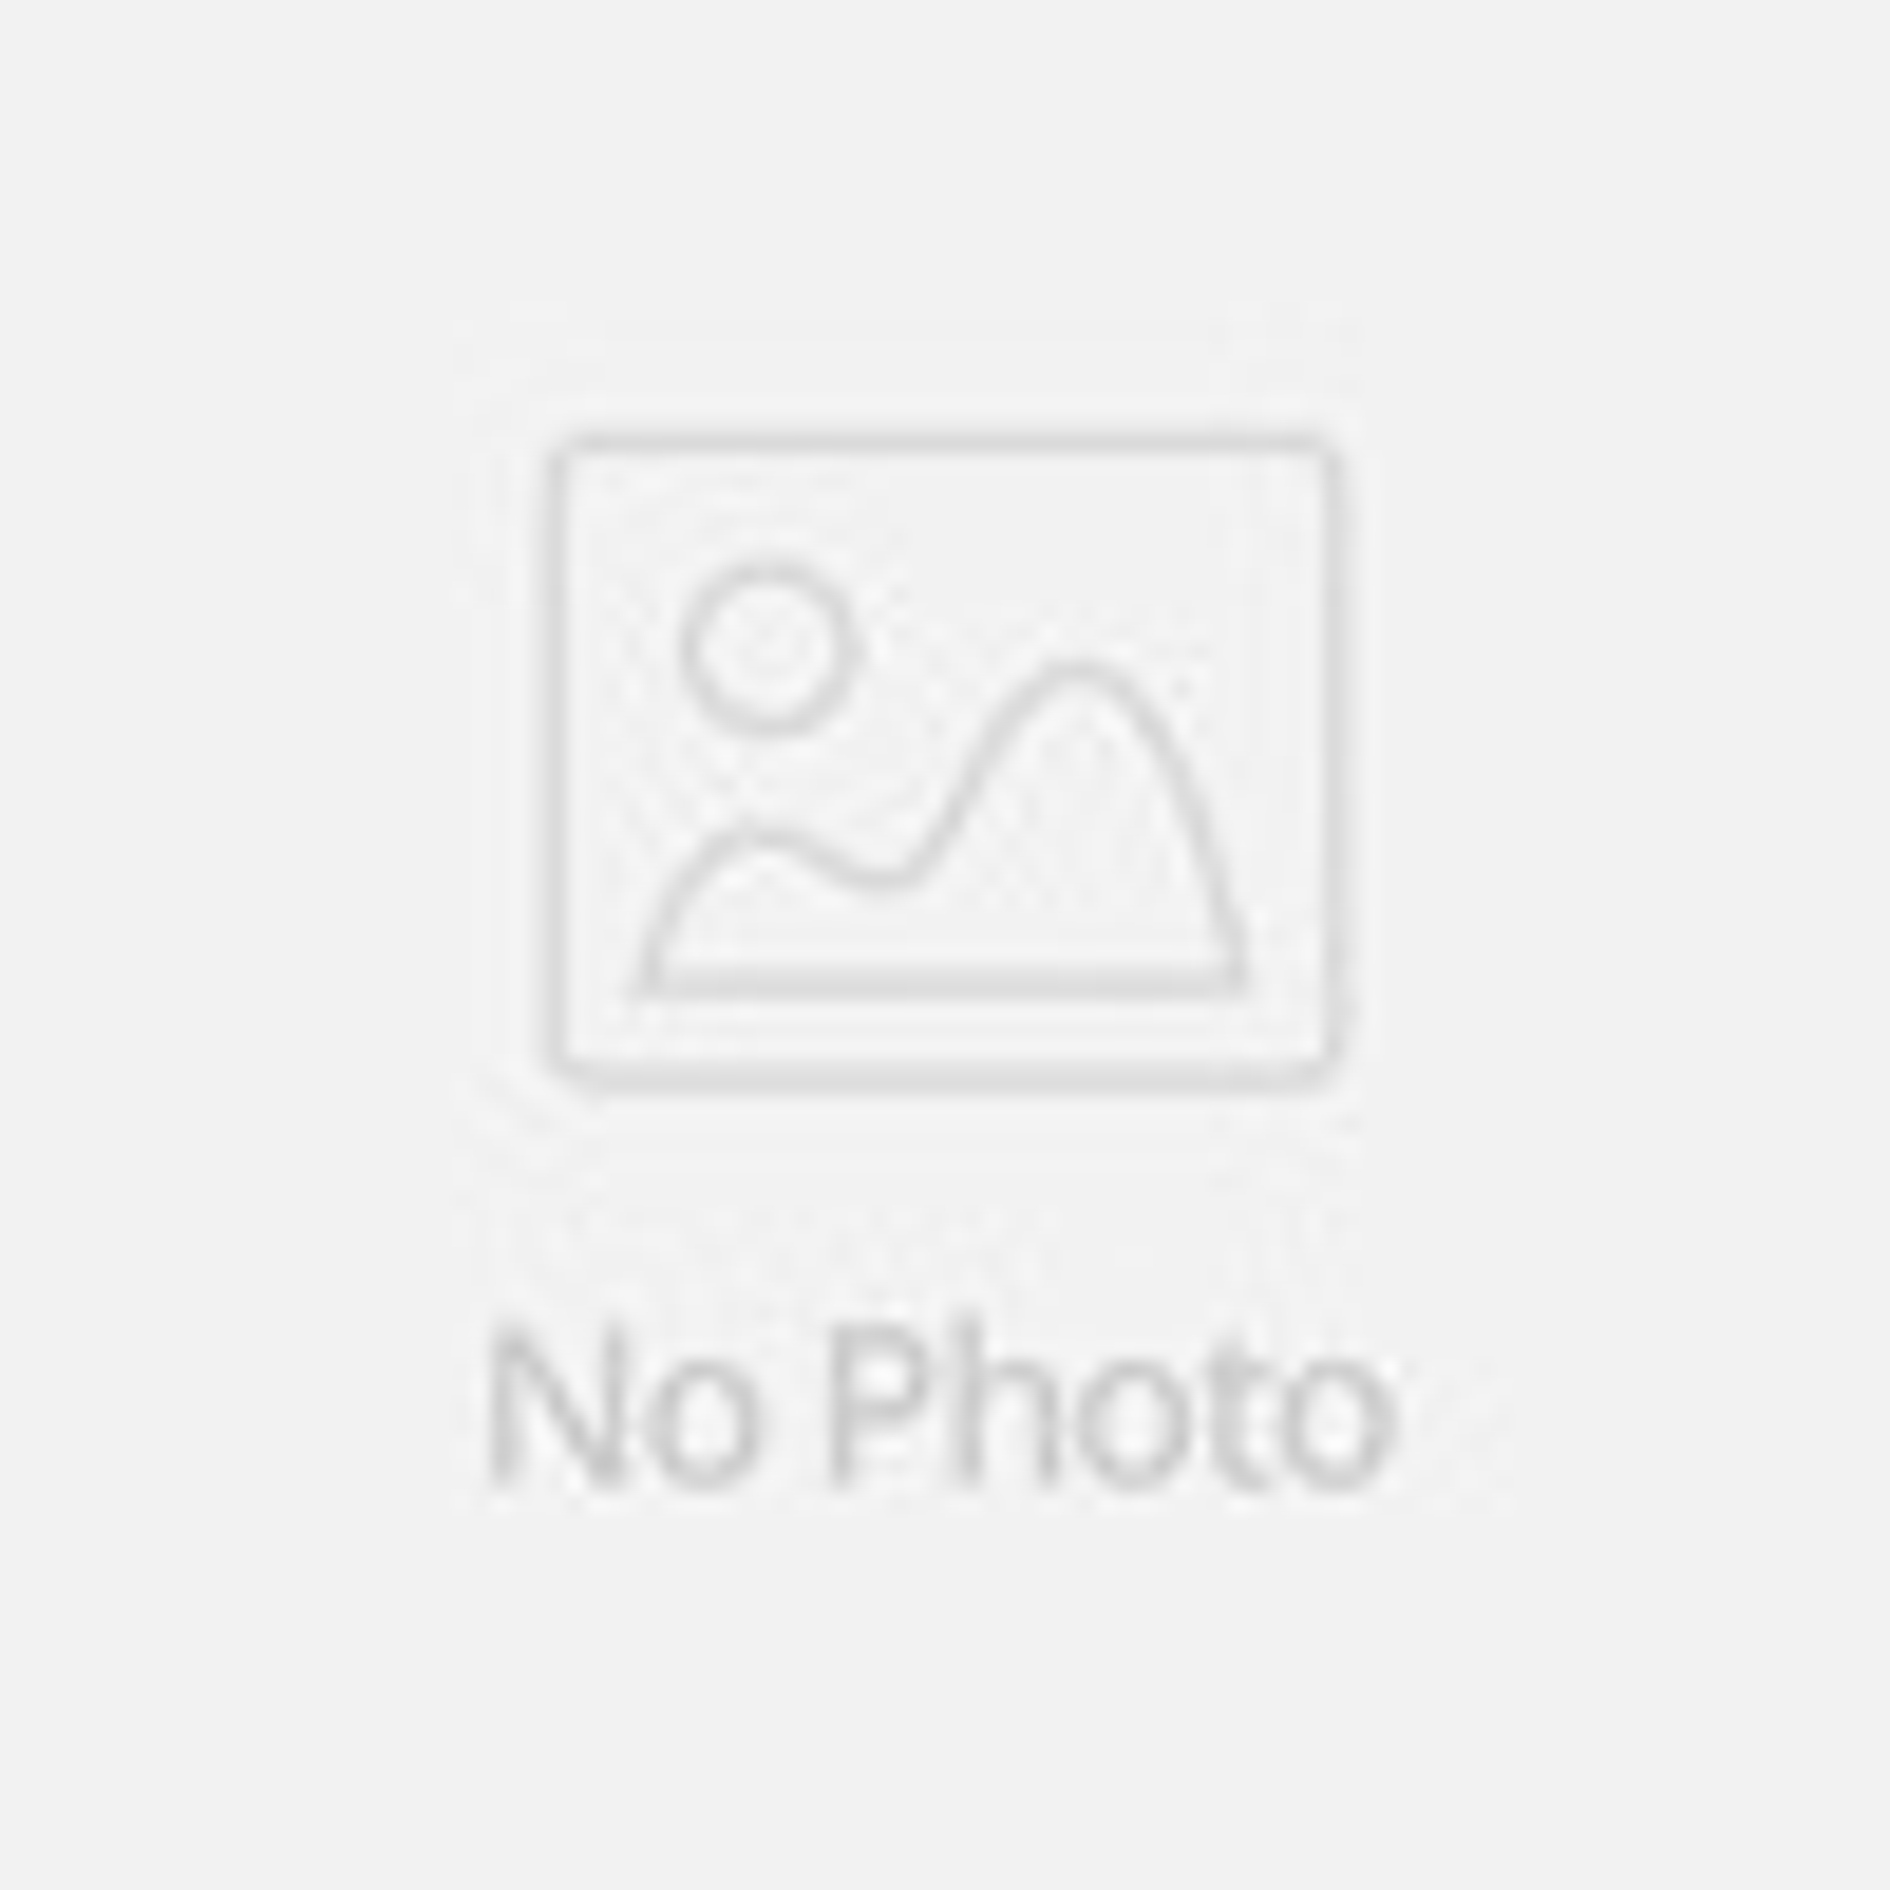 high cpu low power 1037u network mini computer x26-1037G fanless desktop pc 4g ram 320g hdd industrial pc celeron dual core pc(China (Mainland))